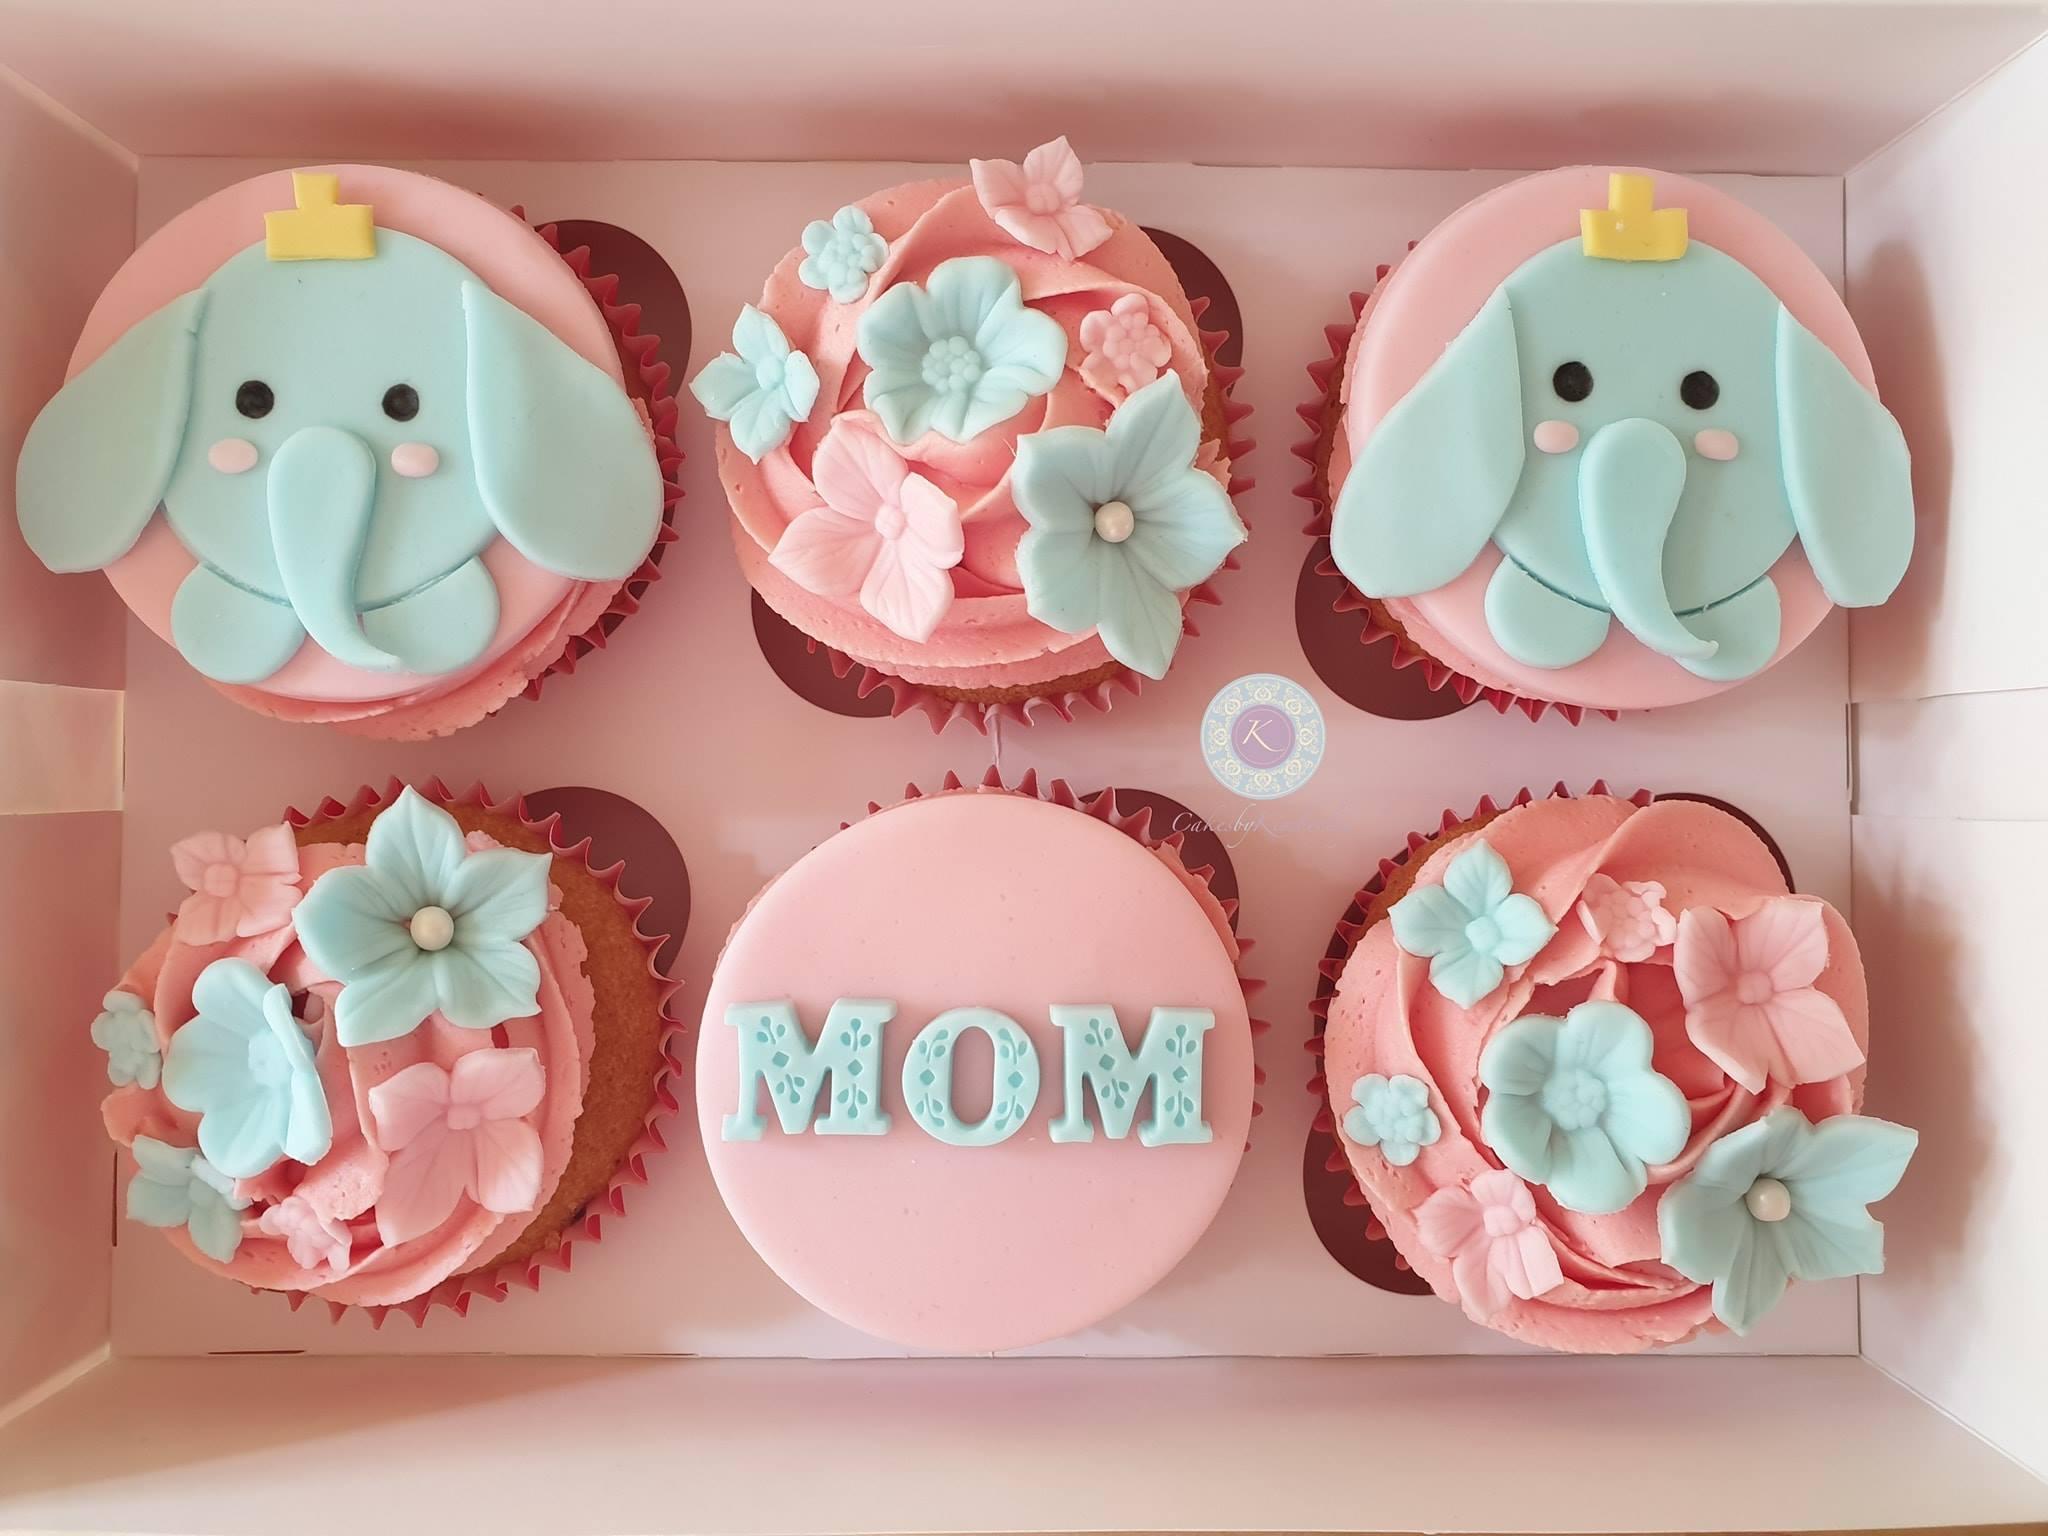 Cupcakes - Dumbo